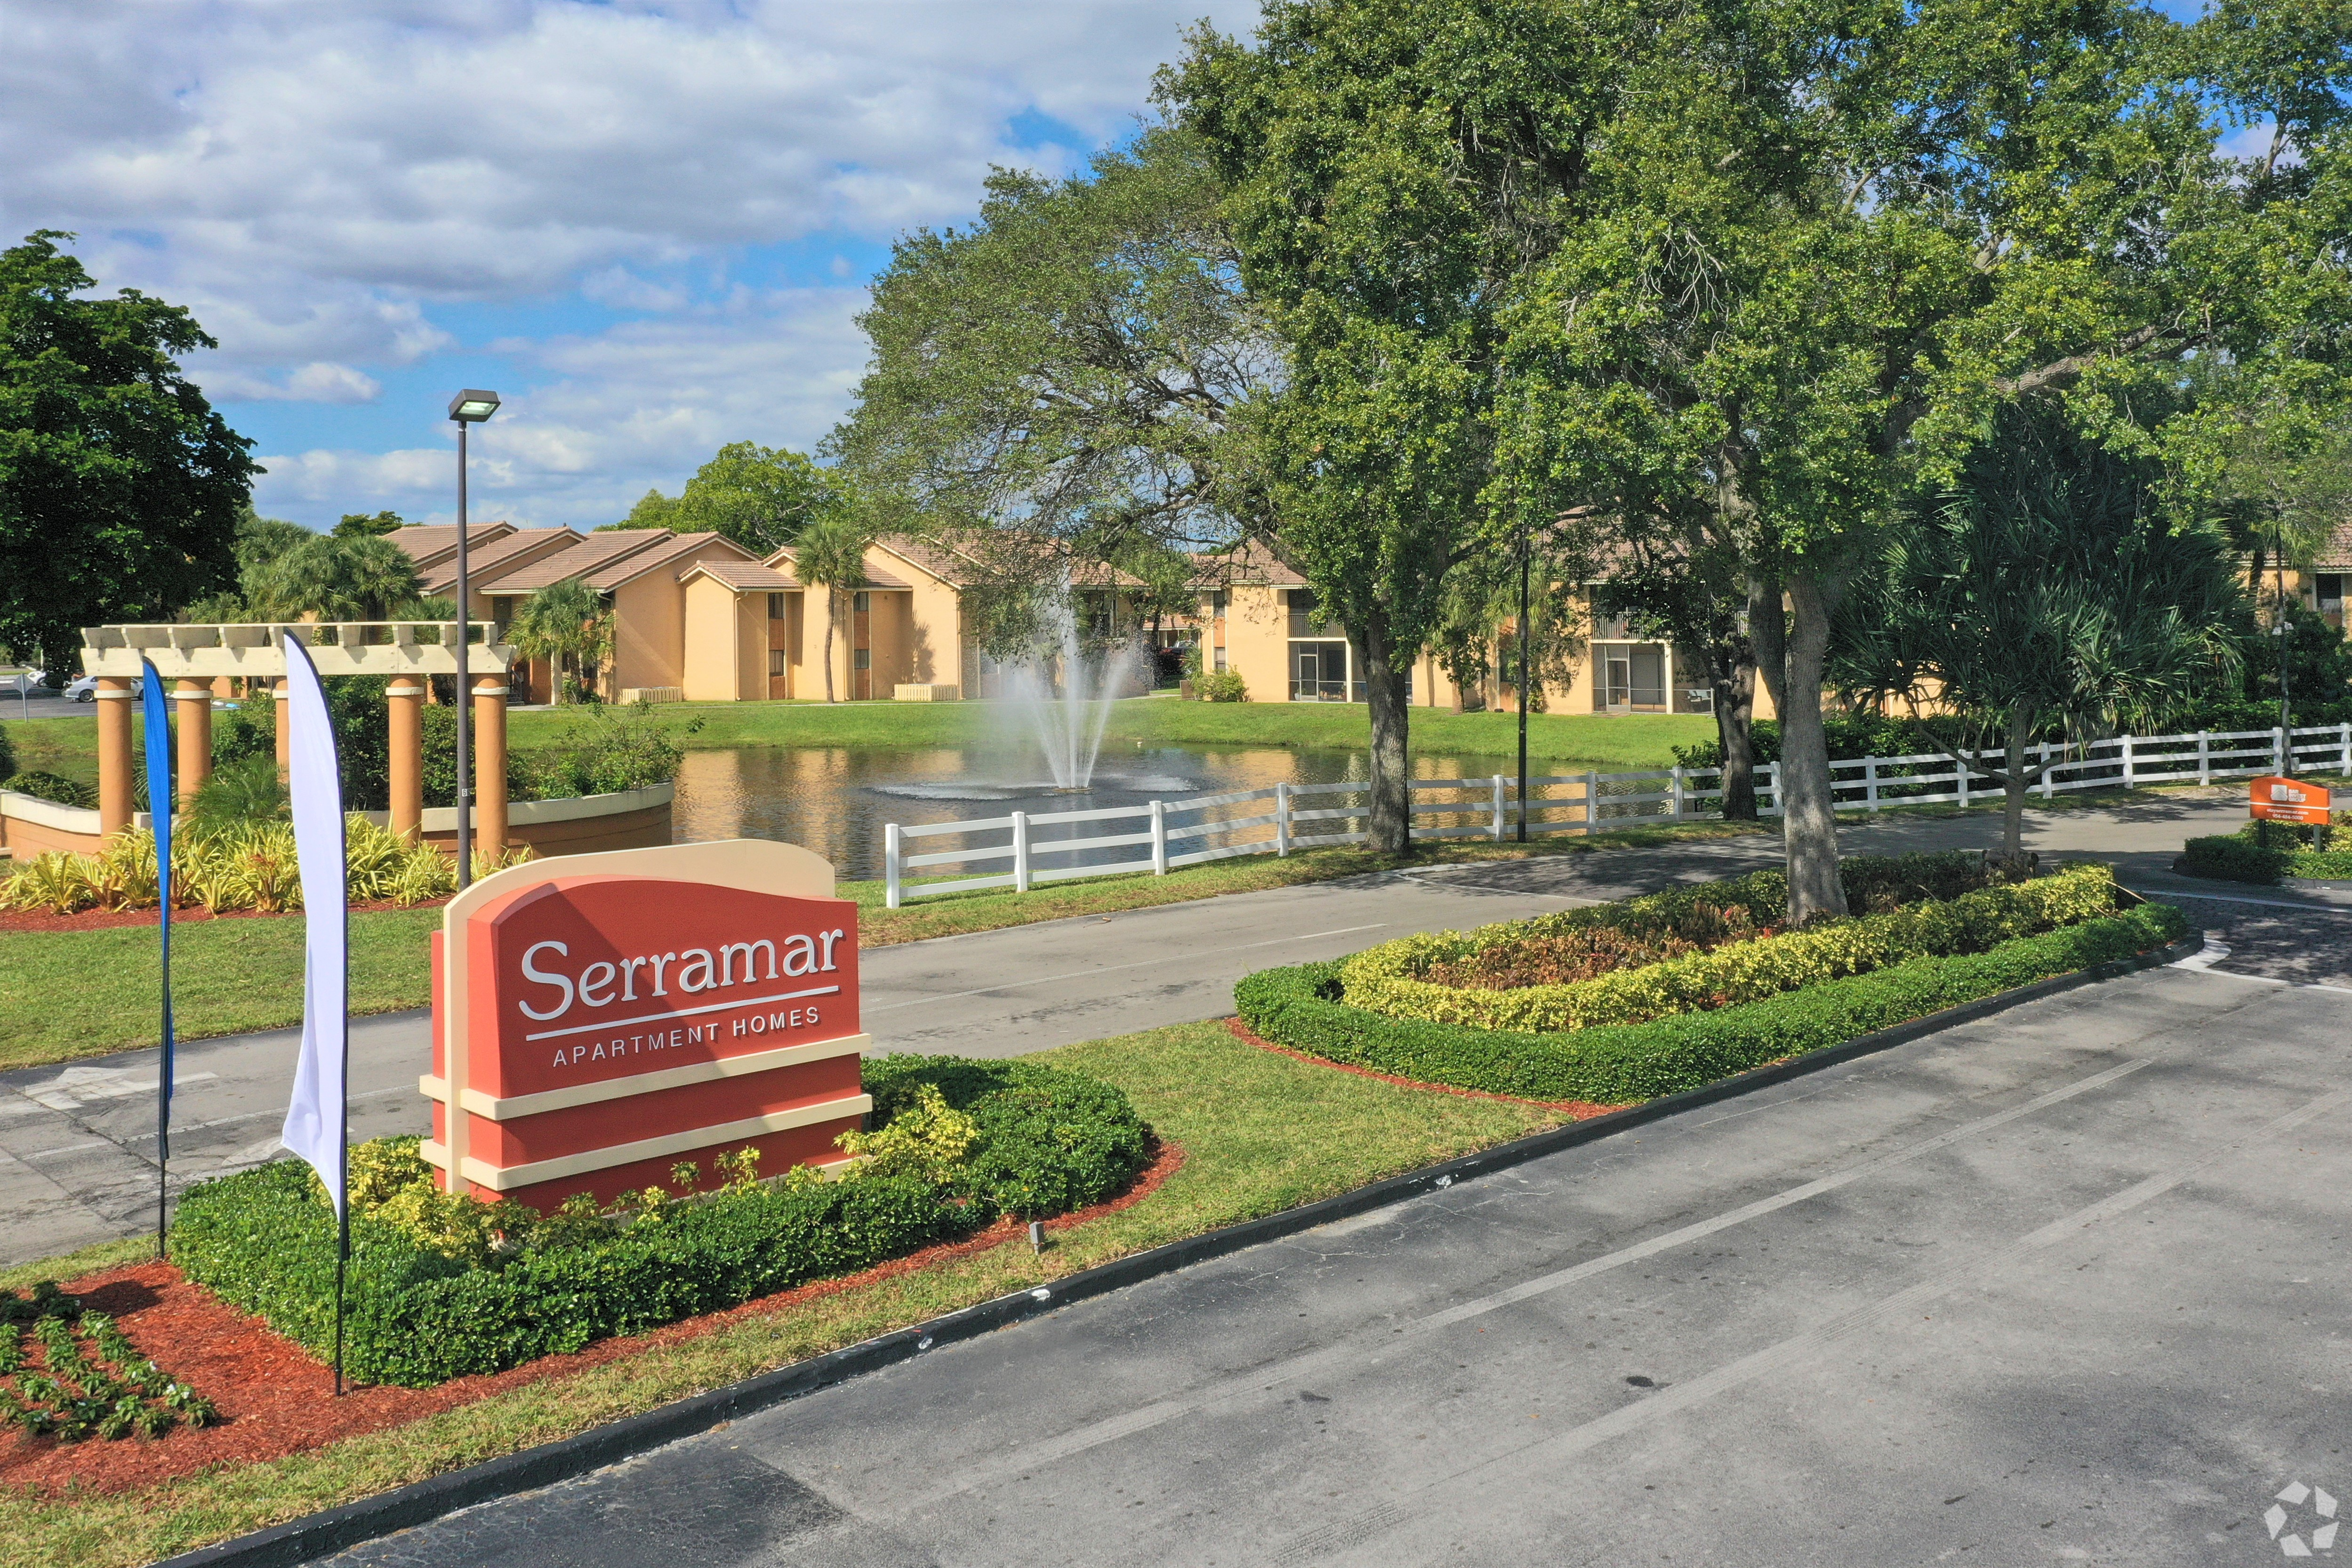 Serramar Apartments